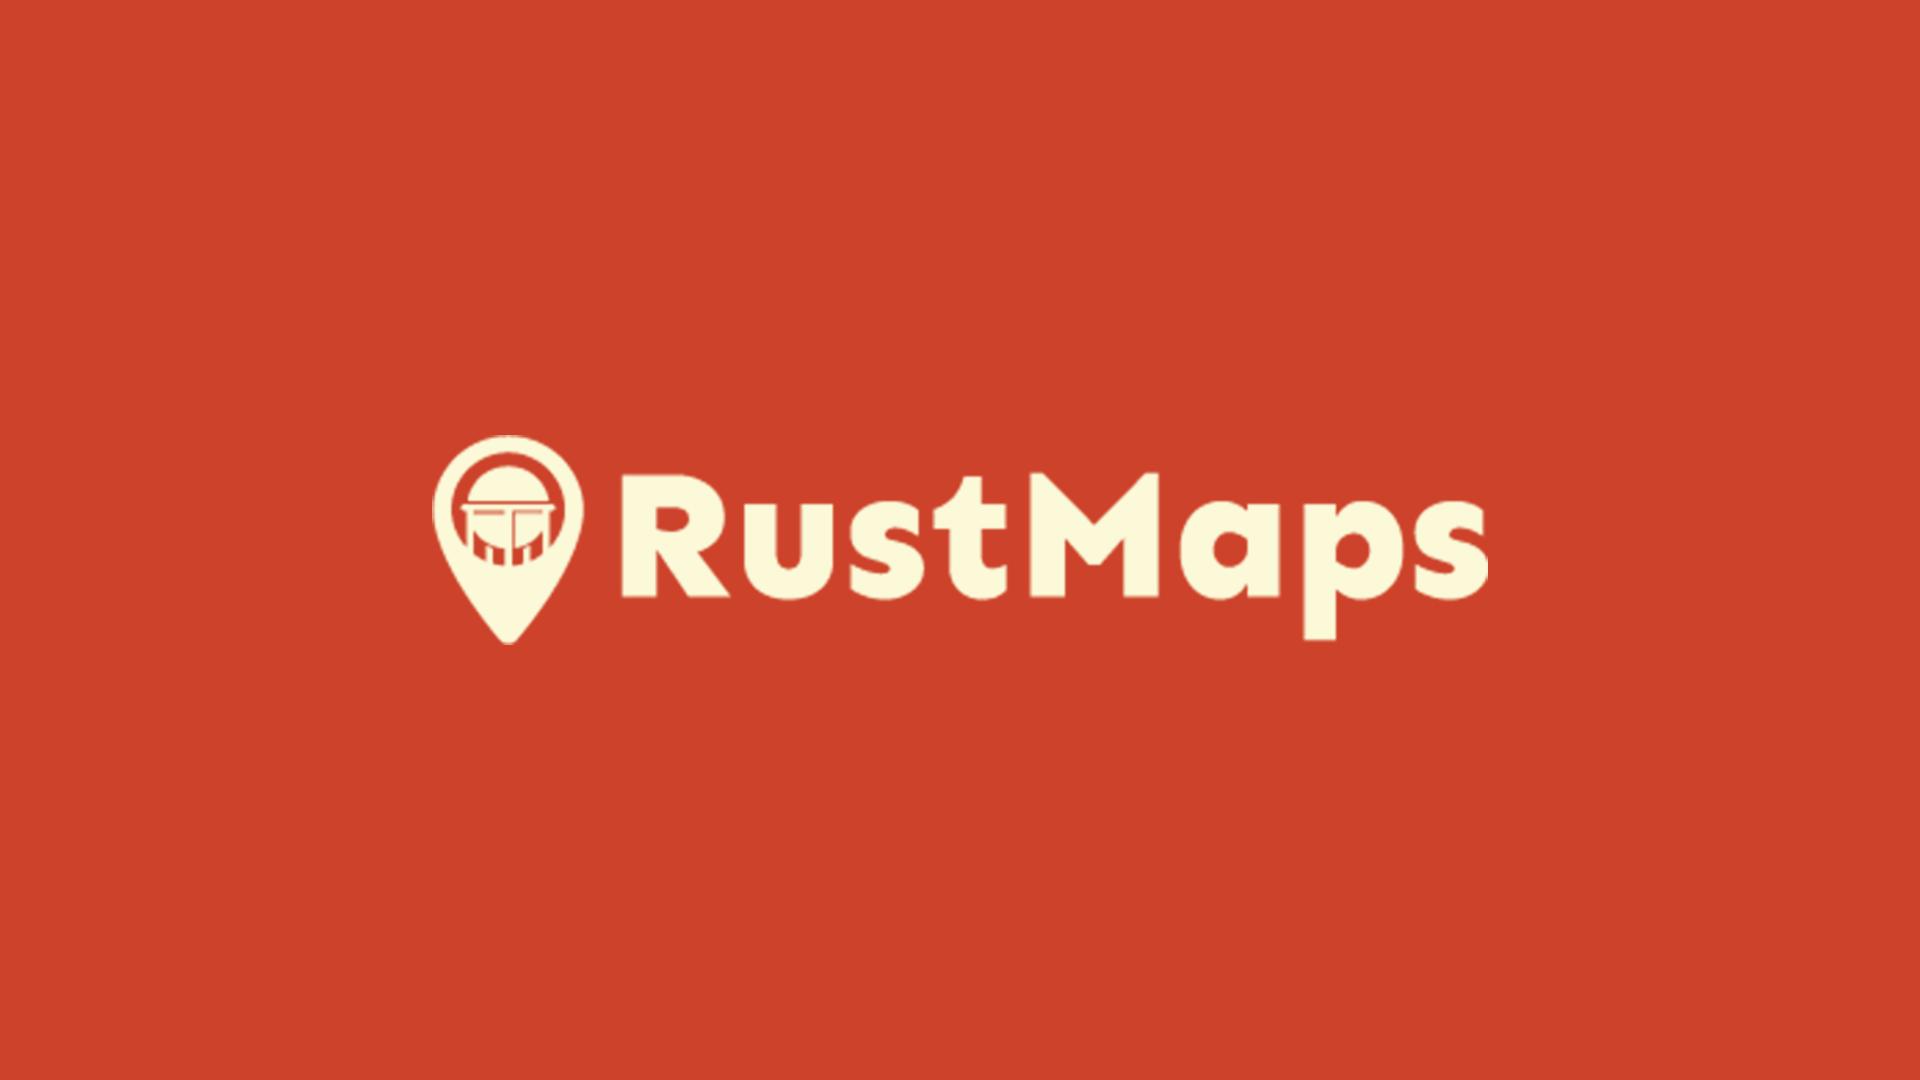 rust-maps